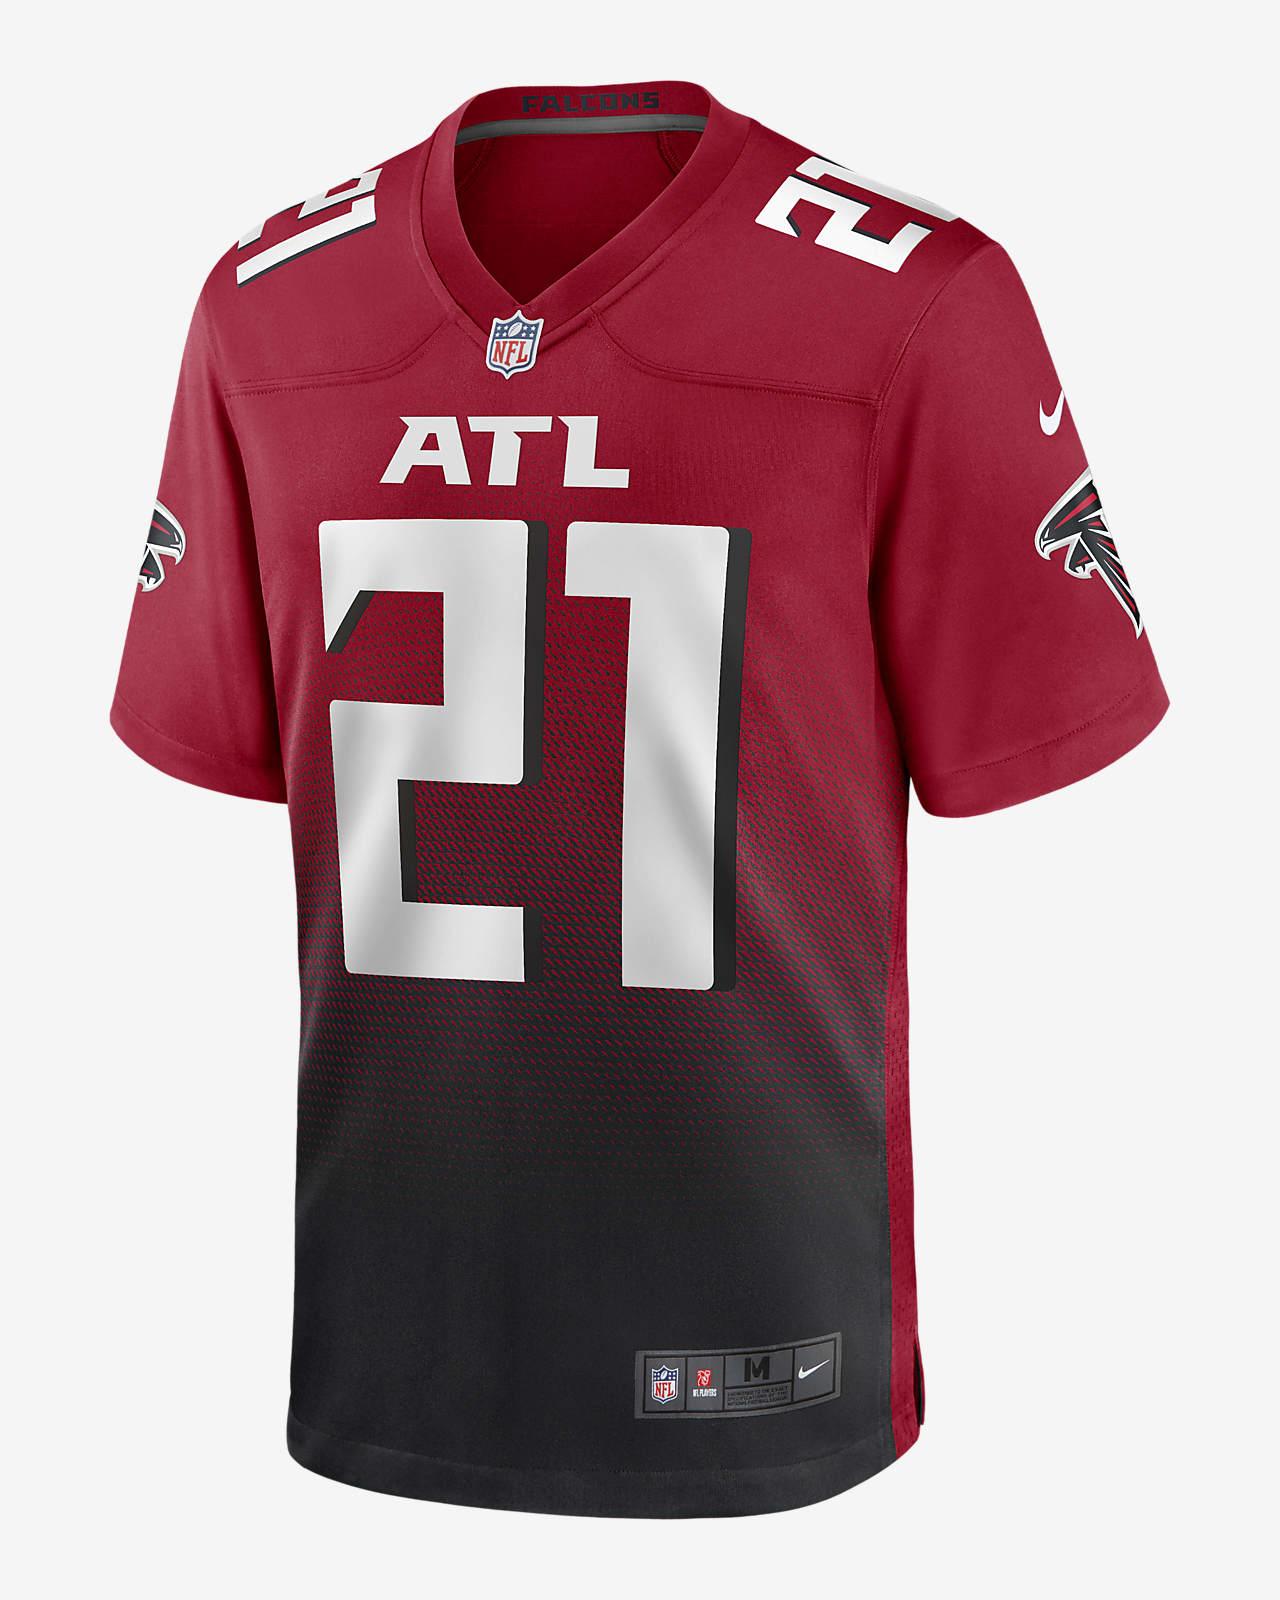 NFL Atlanta Falcons (Todd Gurley) Men's Game Football Jersey